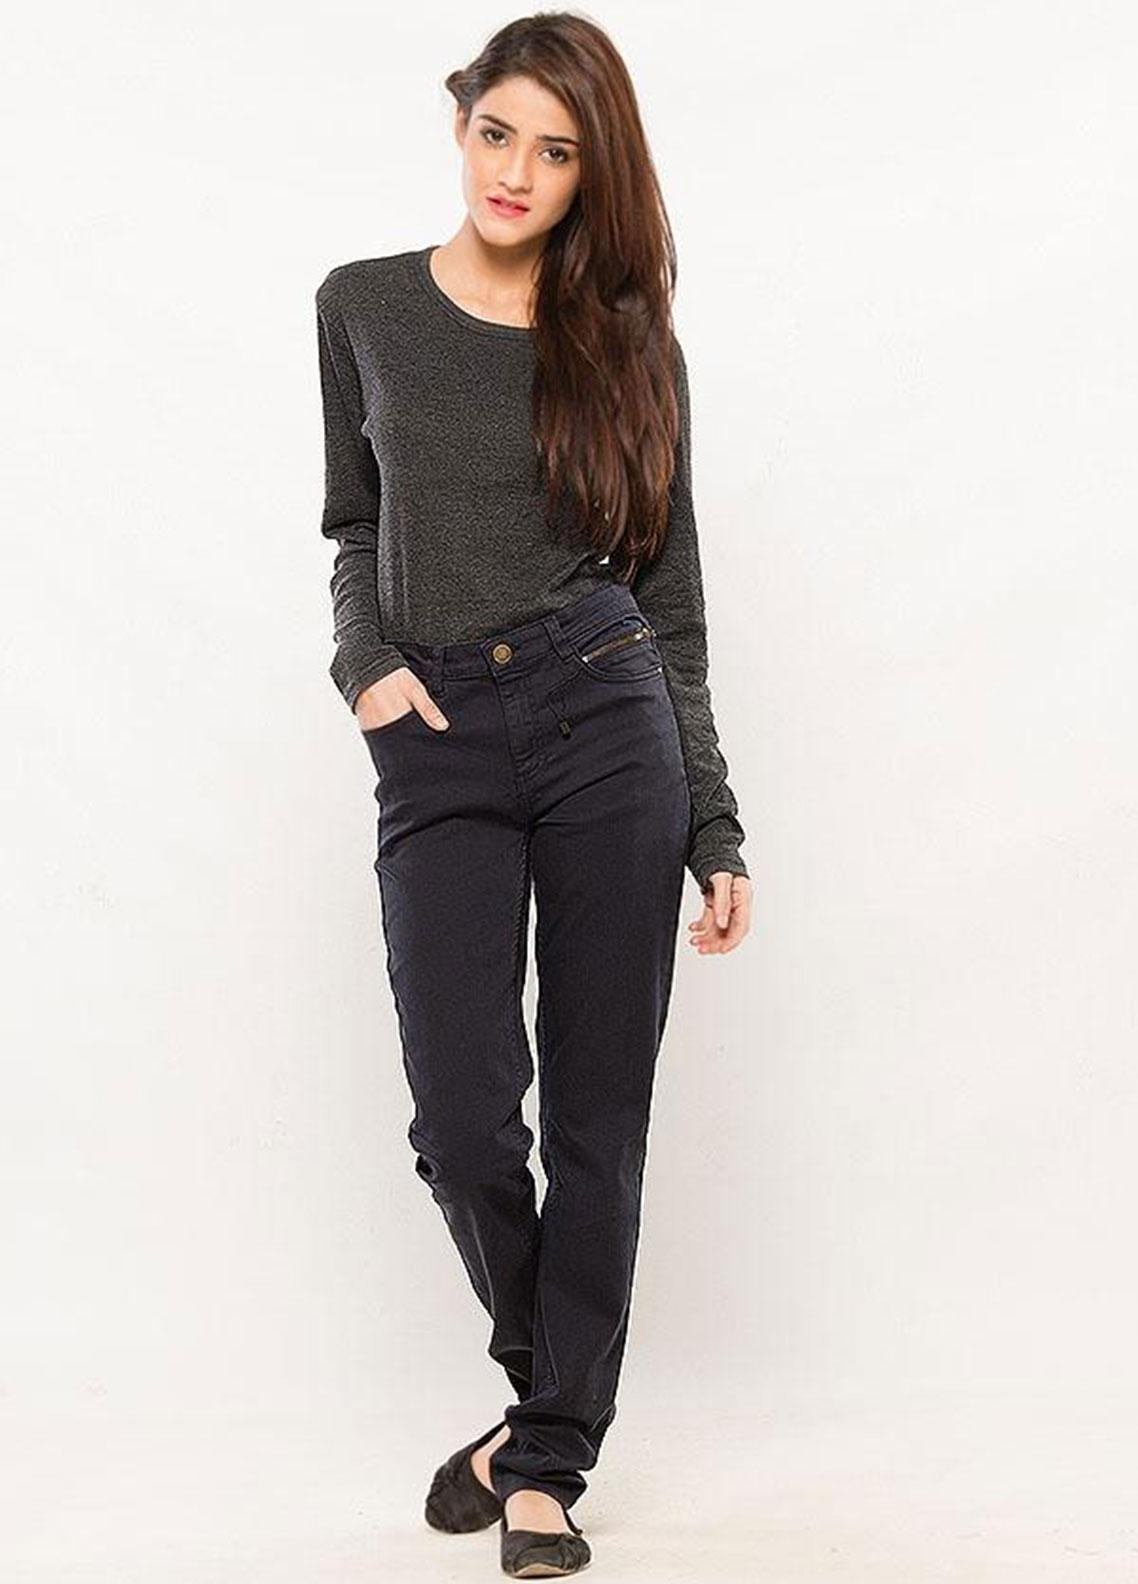 Ignite Wardrobe Stretchable Cotton Slim Fit Pants IG20PNW 009